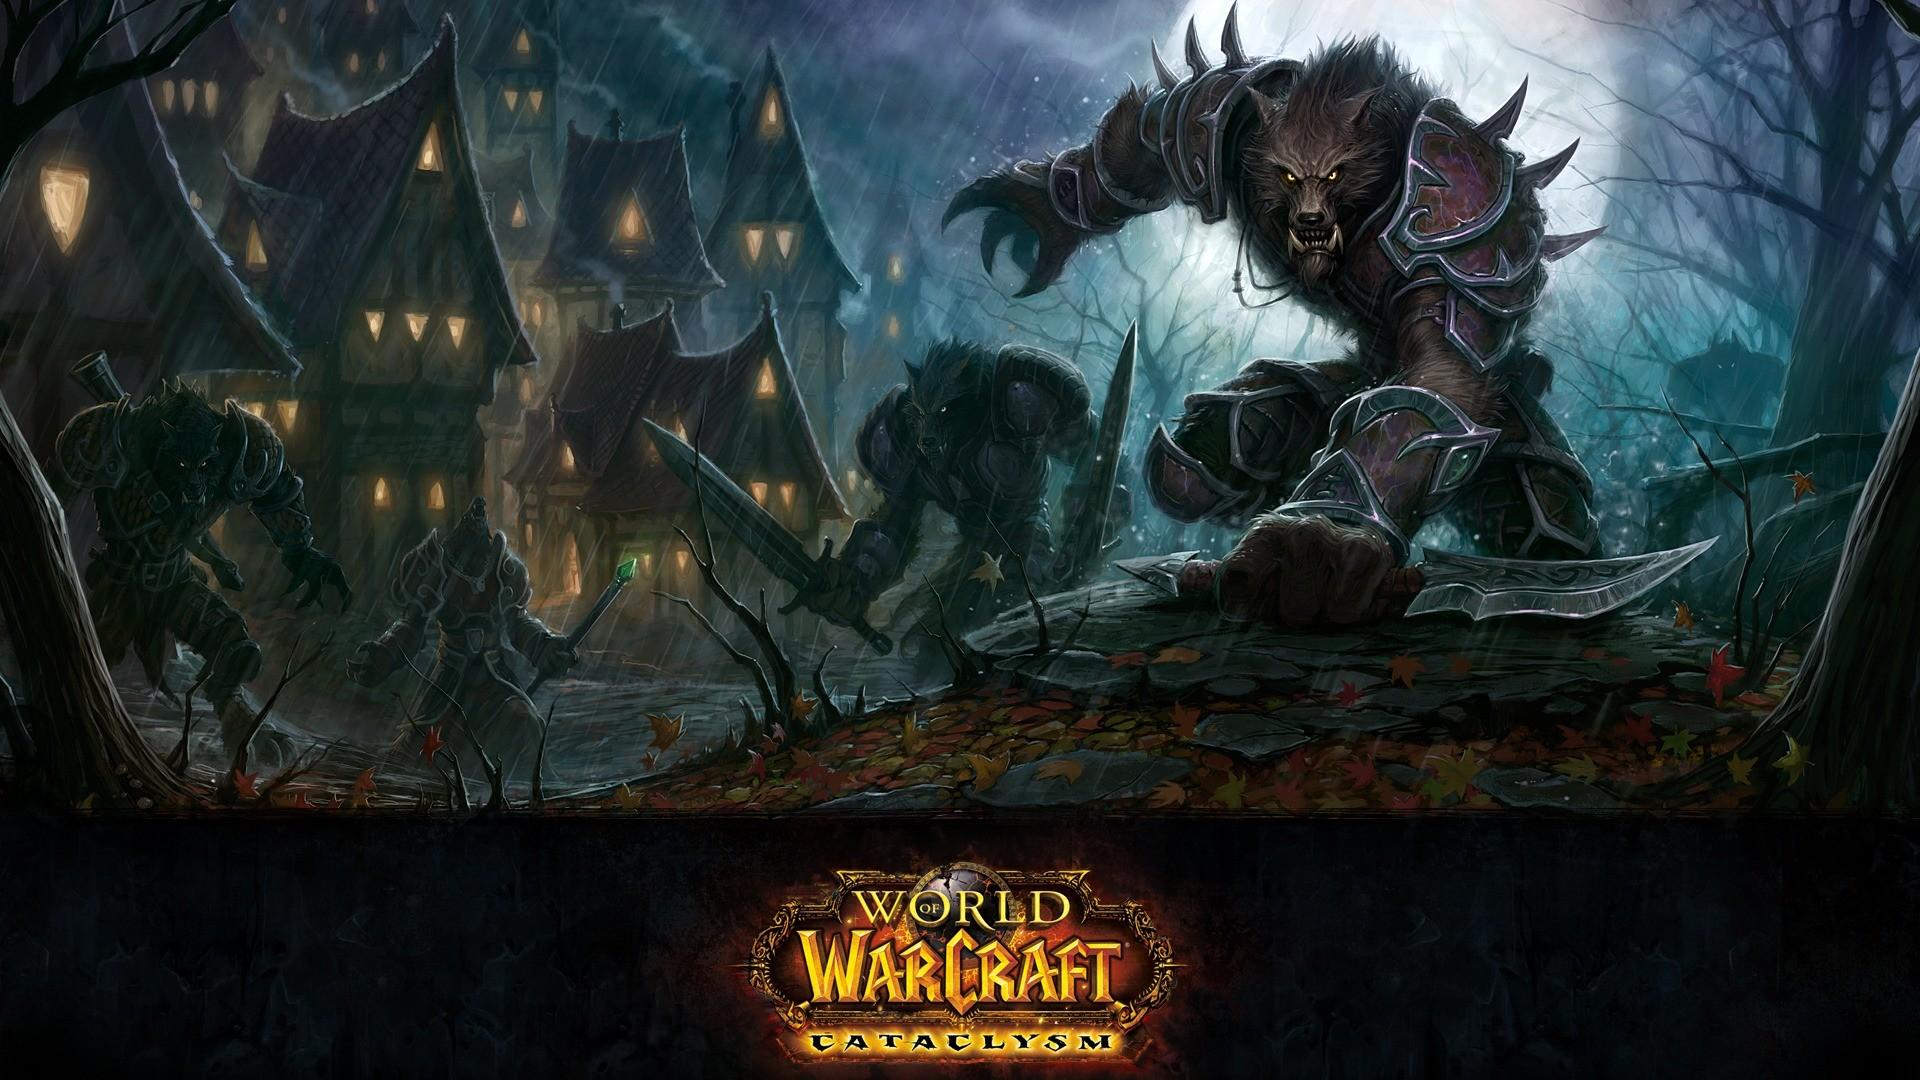 World of Warcraft Cataclysm Wallpaper World of Warcraft Games Wallpapers